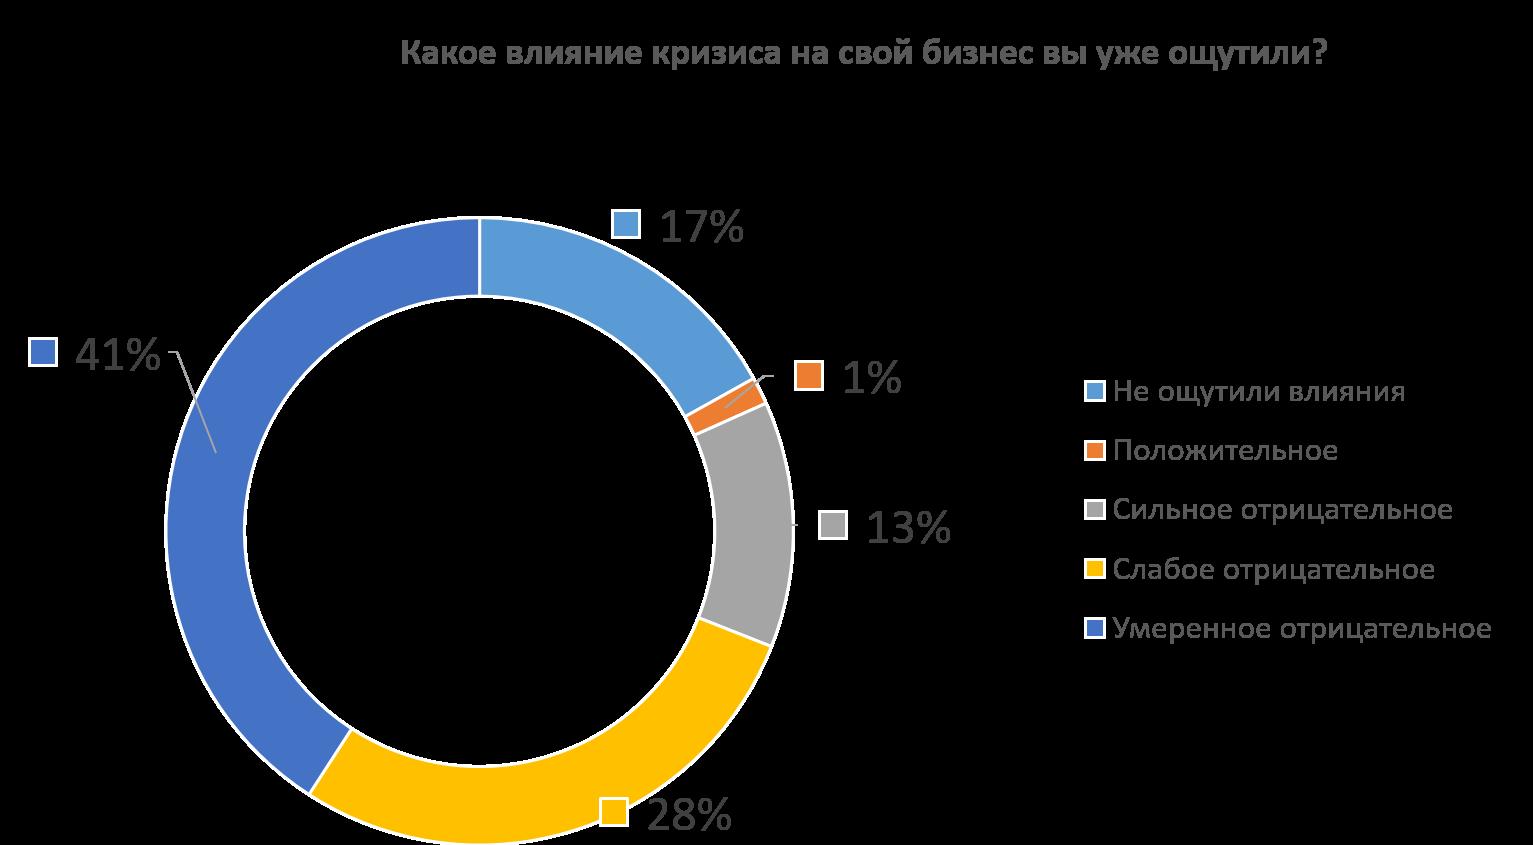 Влияние коронакризиса на финансовове состояние ИТ компаний